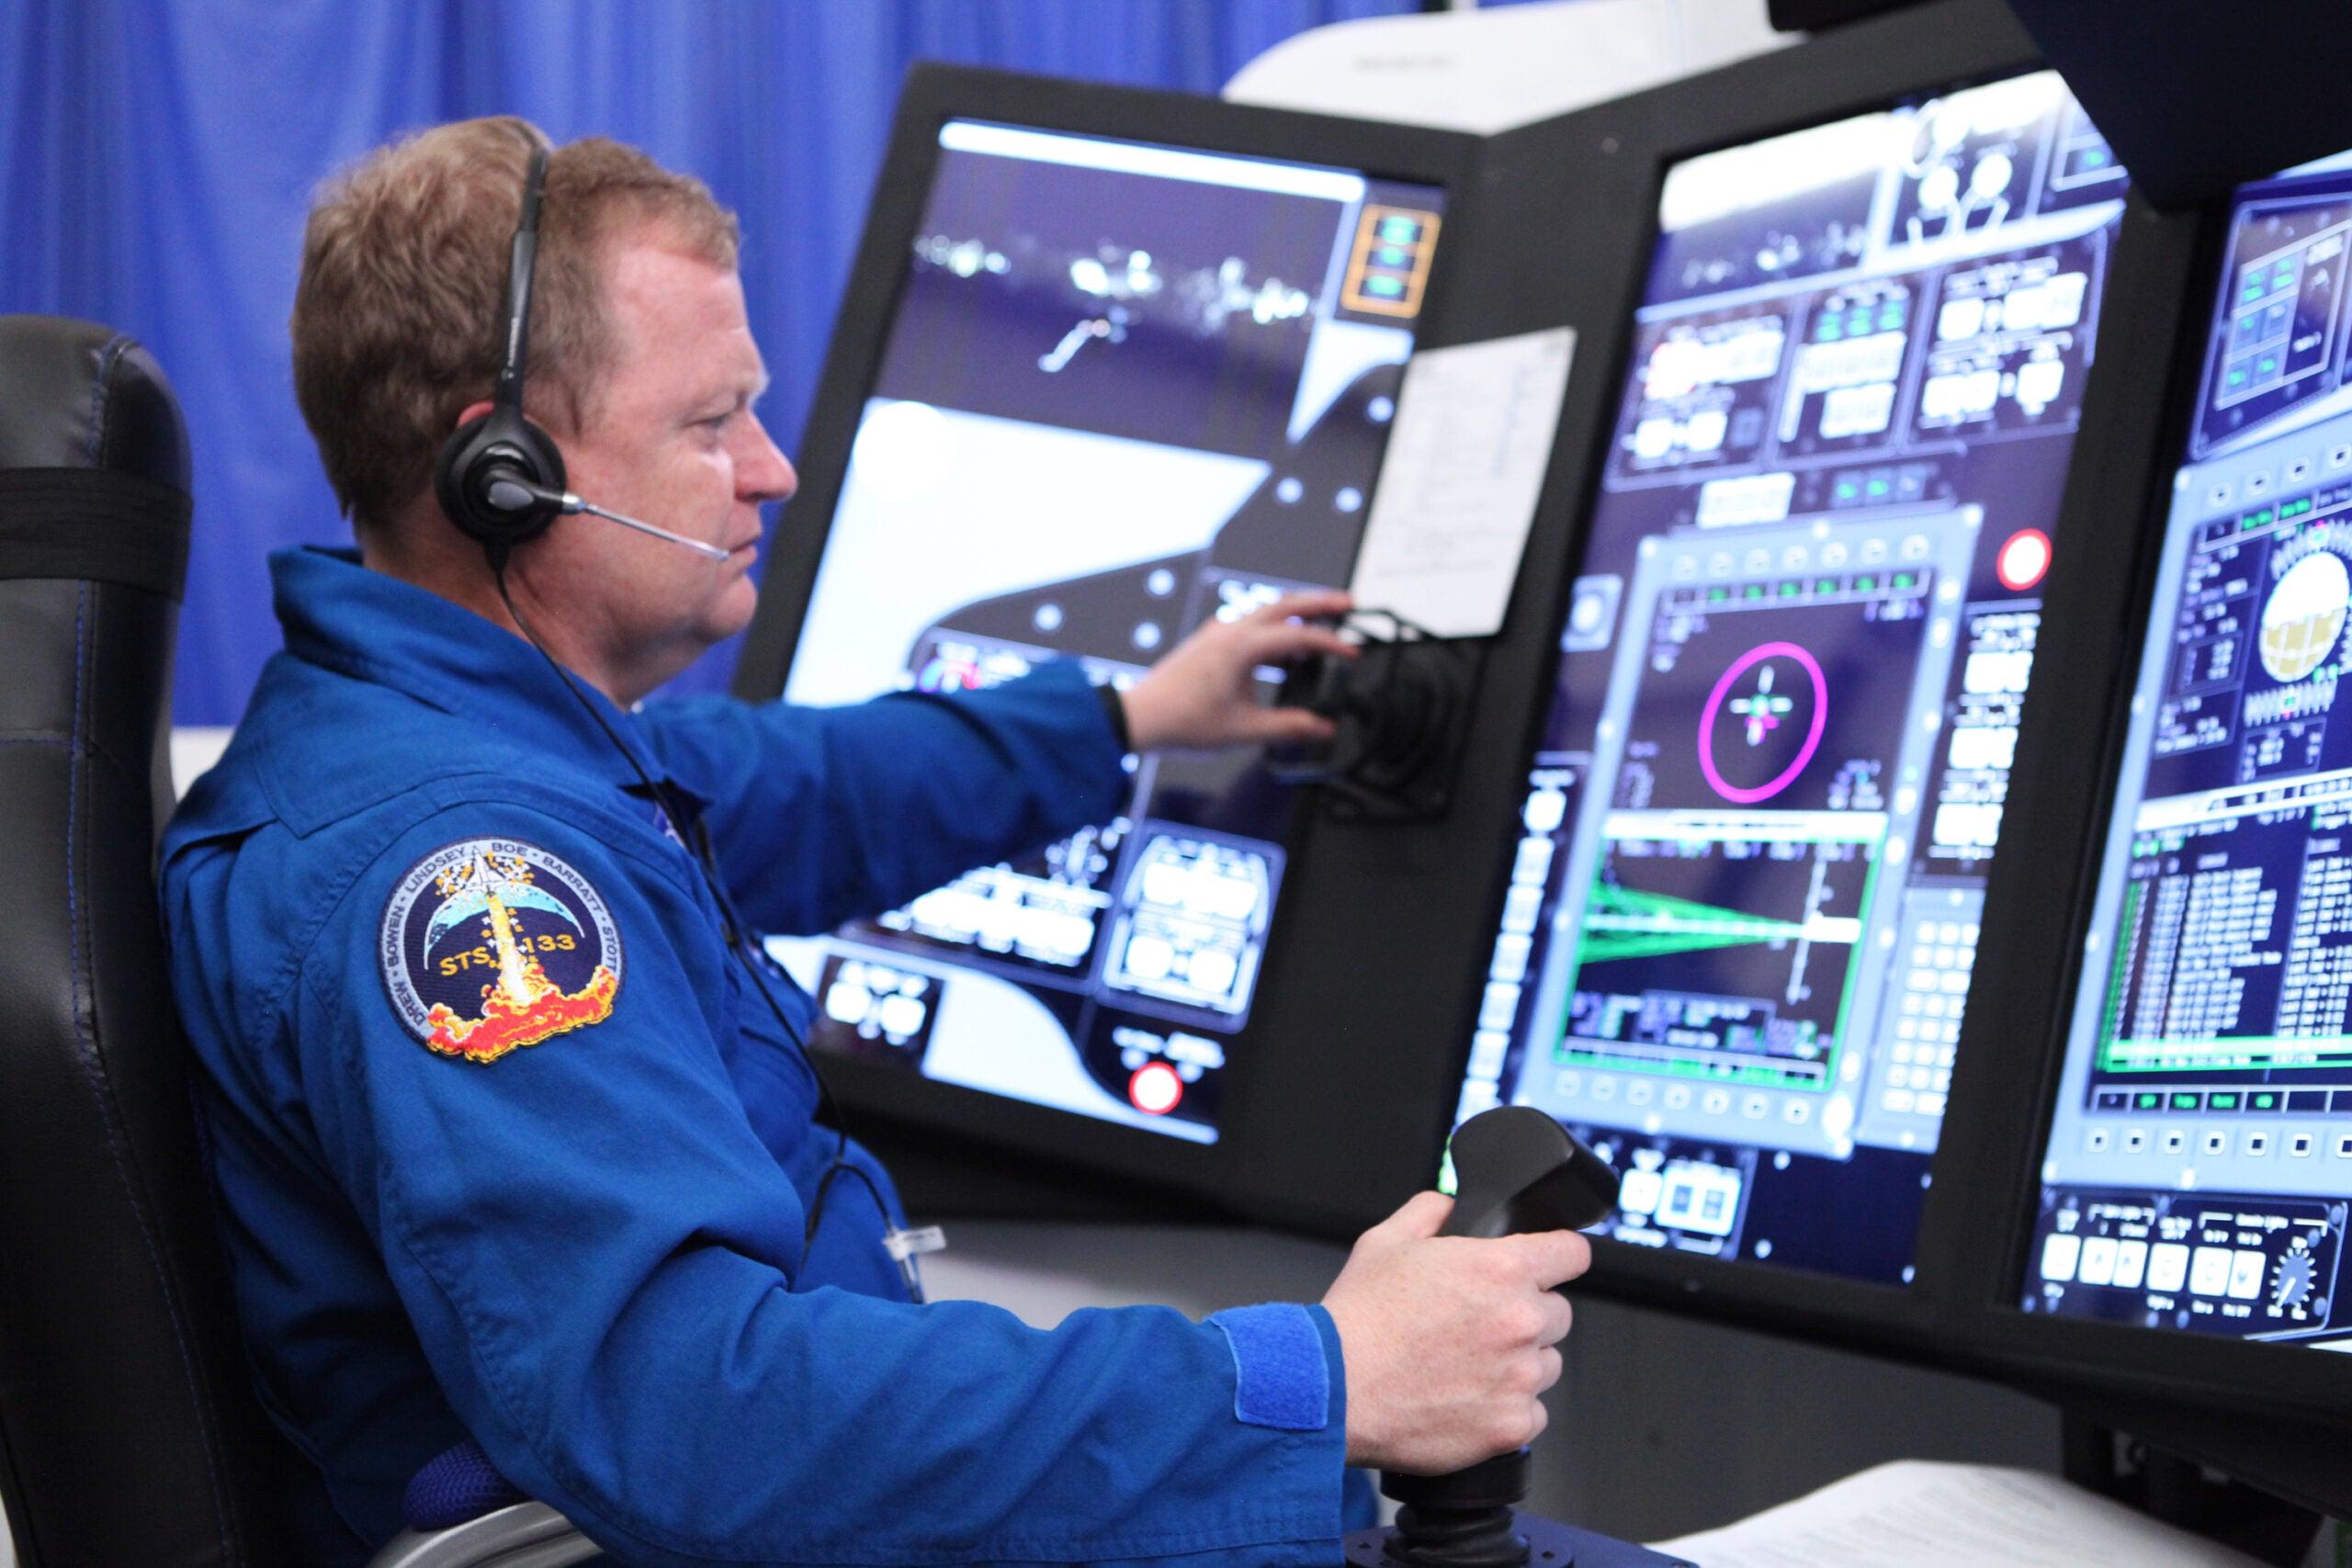 NASA Finally Has Touchscreen Simulators For Spacecraft